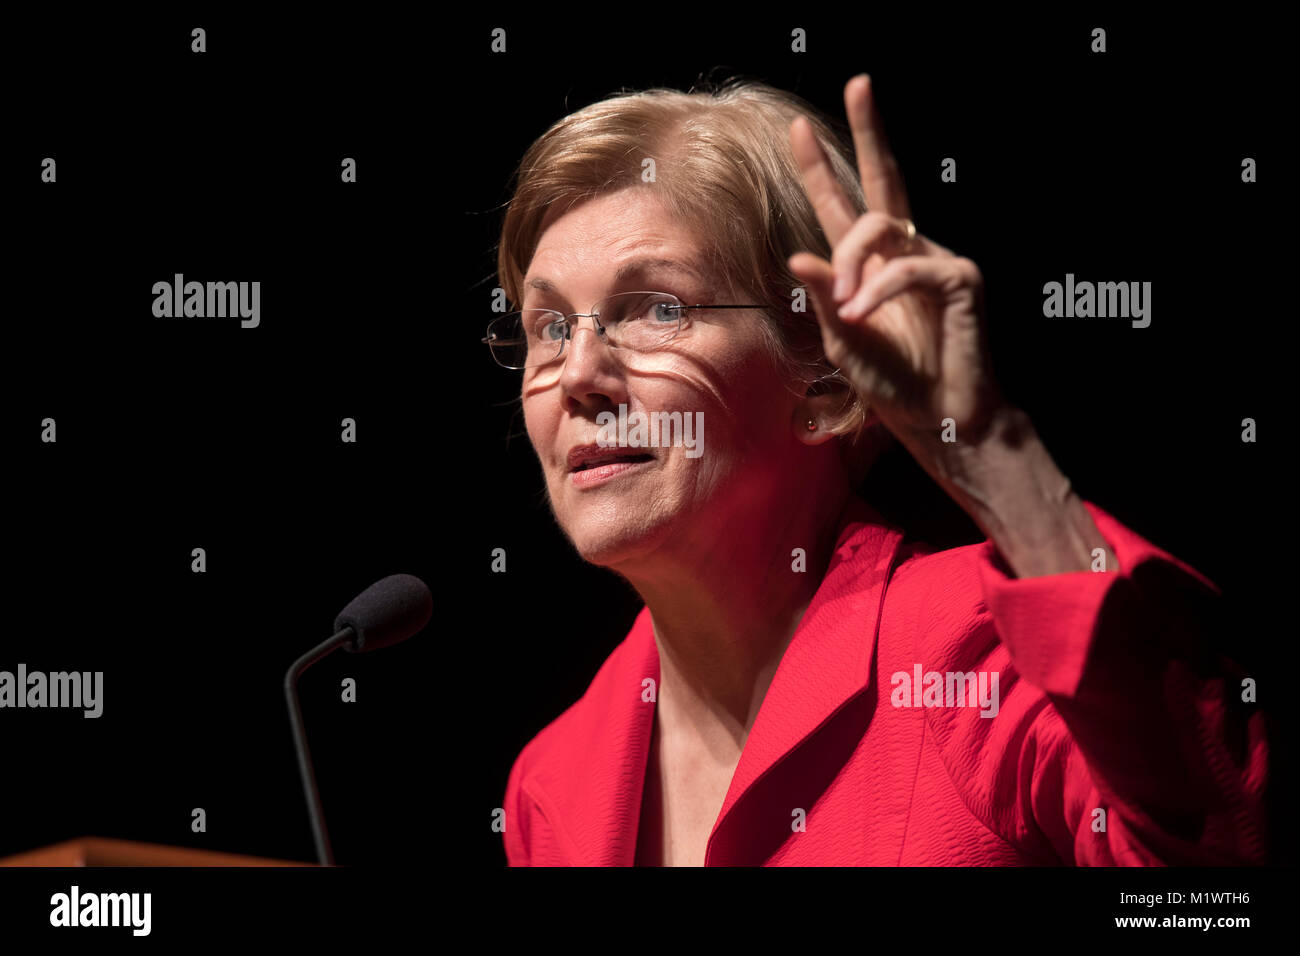 United States senator Elizabeth Warren, a Democrat from Massachusetts, speaks at a 15th anniversary fundraising - Stock Image